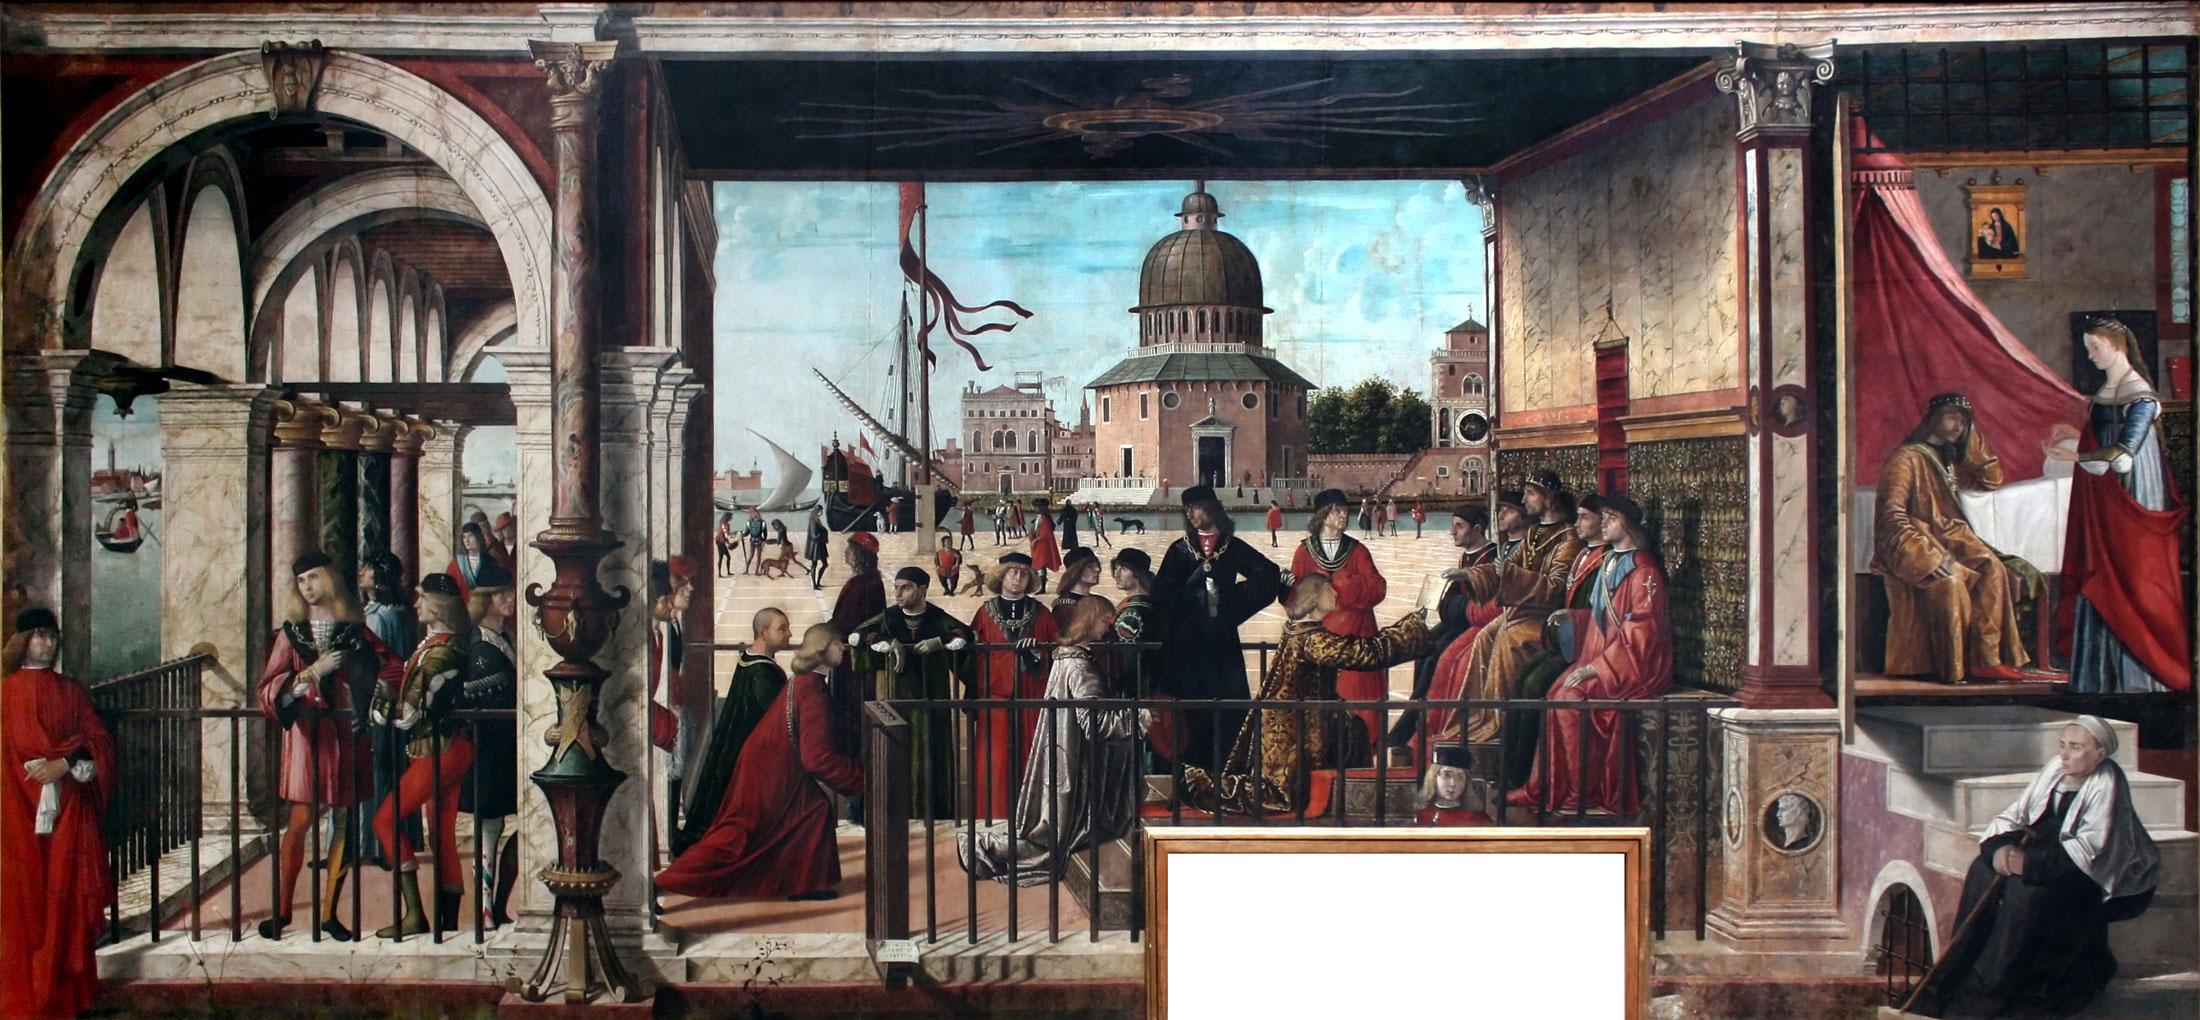 Legend of Saint Ursula - Arrival of the English Ambassadors by Vittore Carpaccio